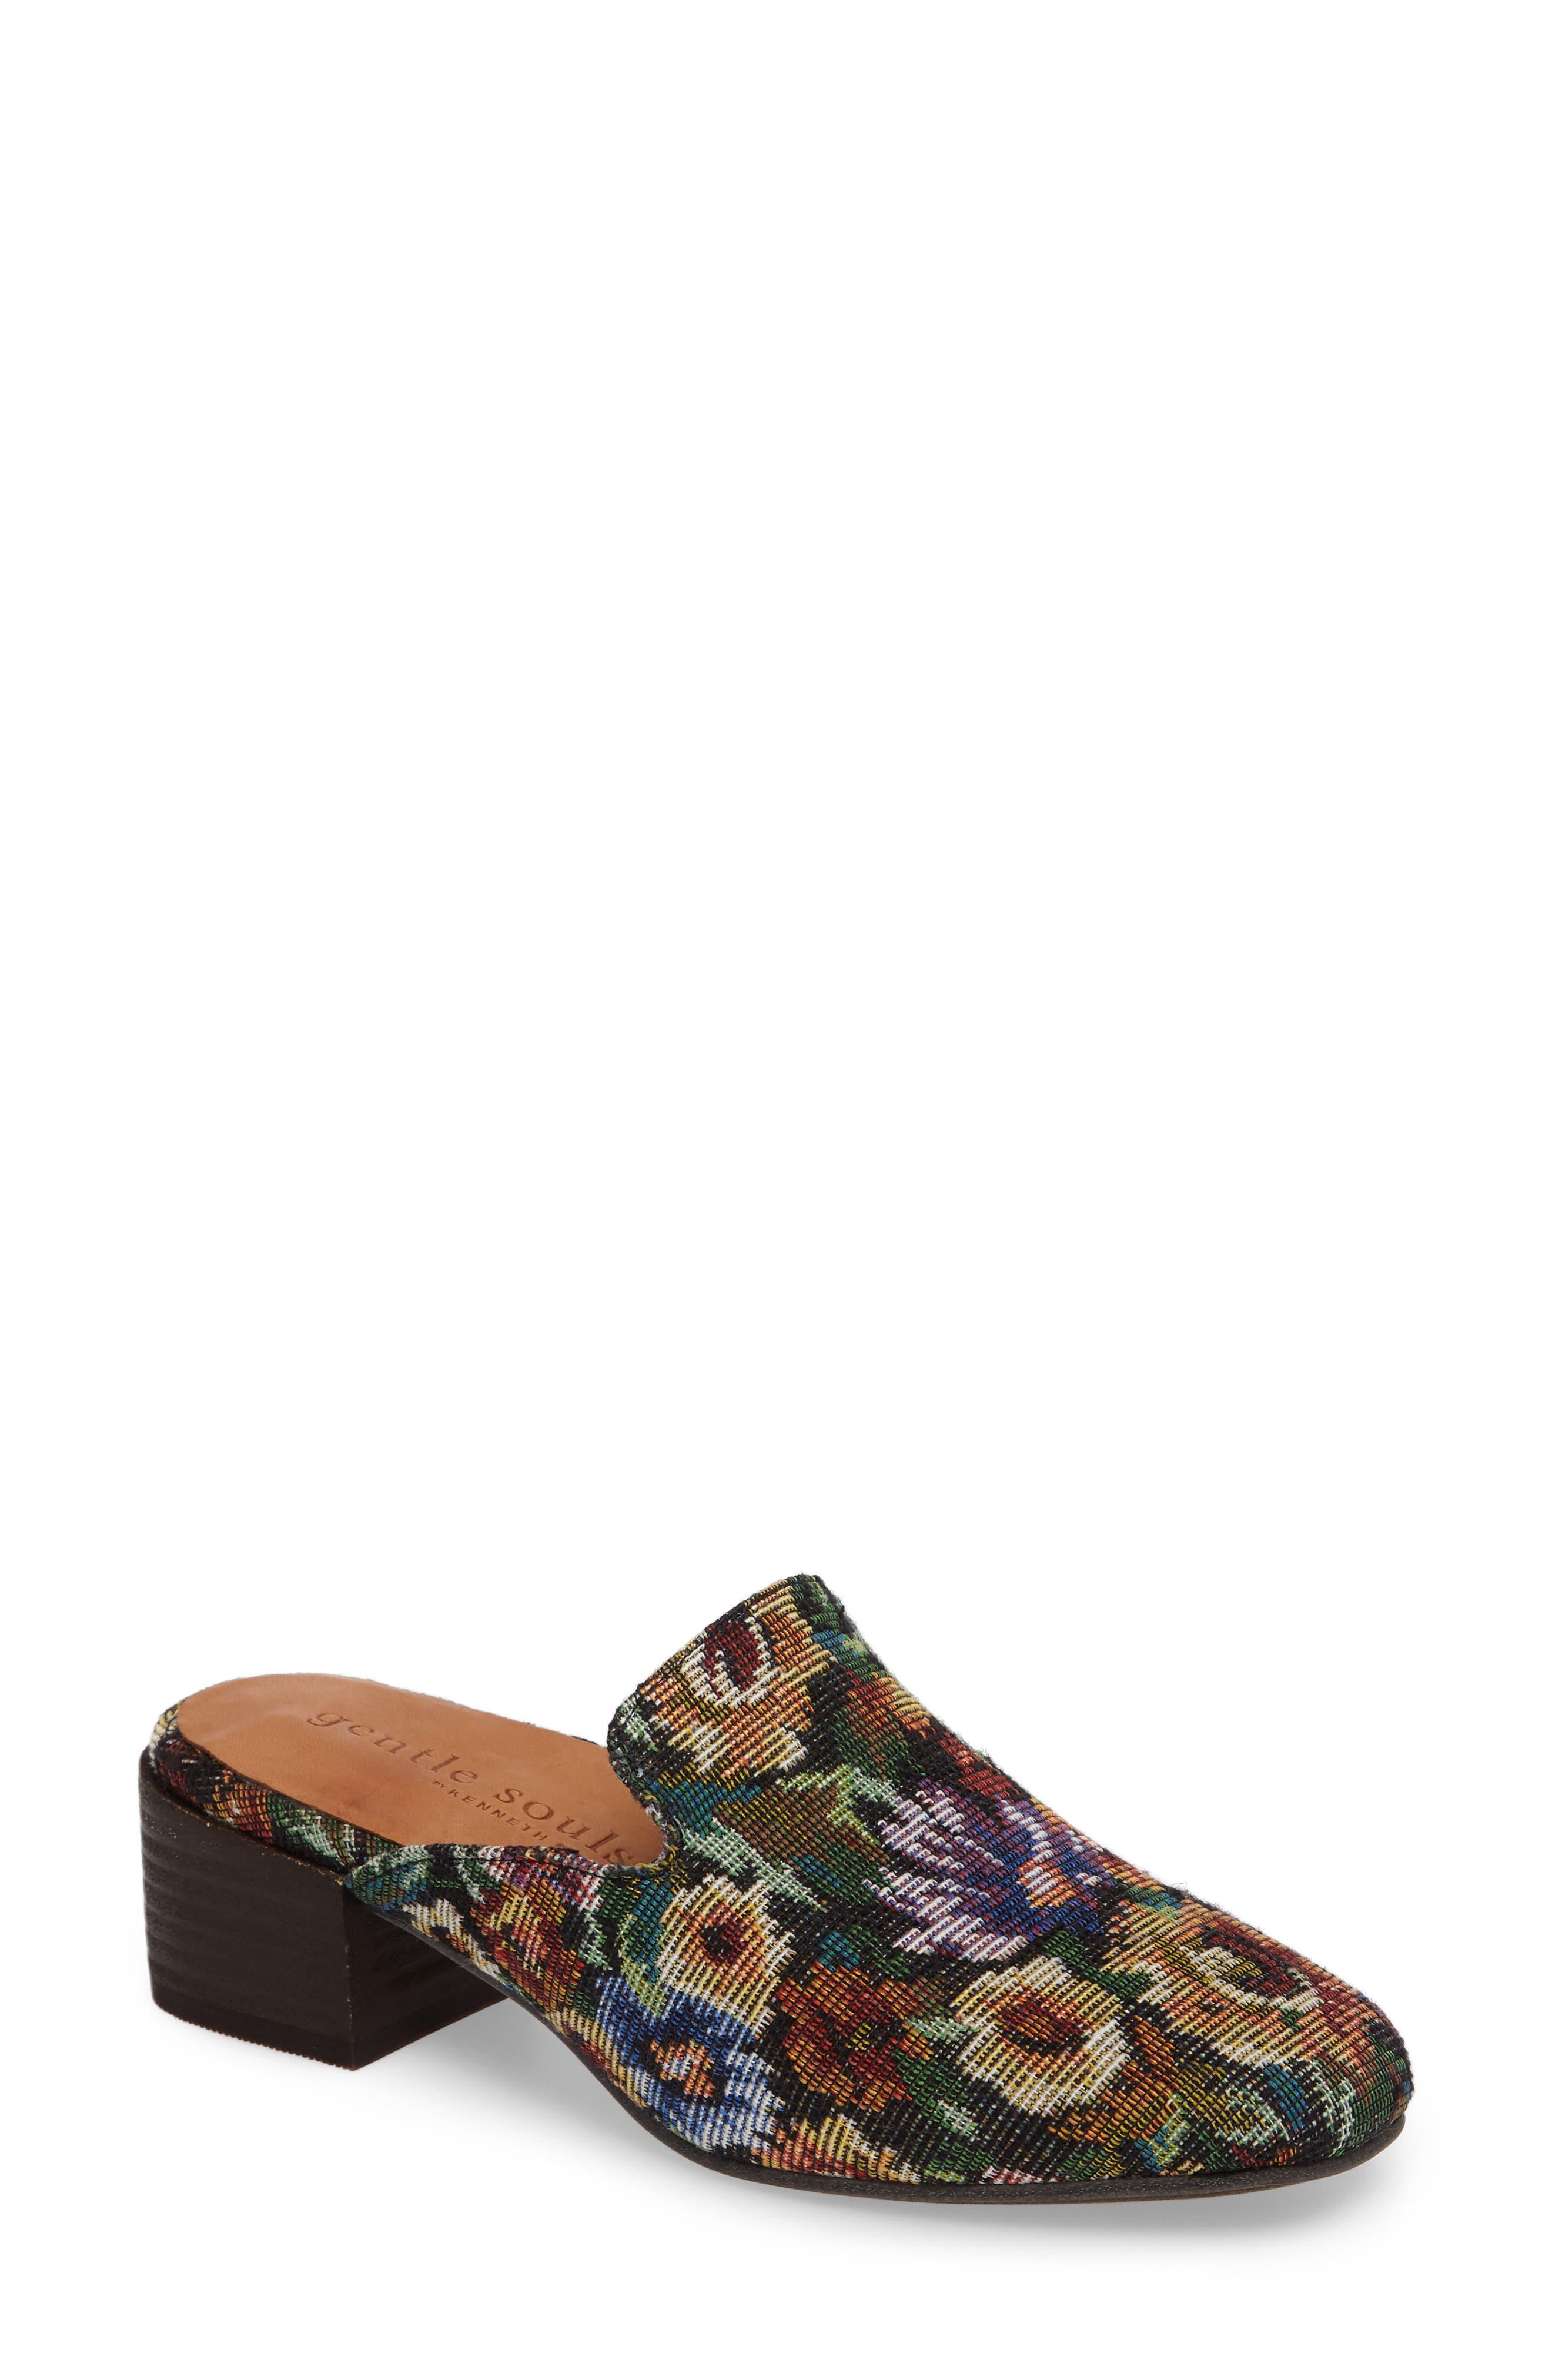 Eida Loafer Mule,                         Main,                         color, Floral Fabric